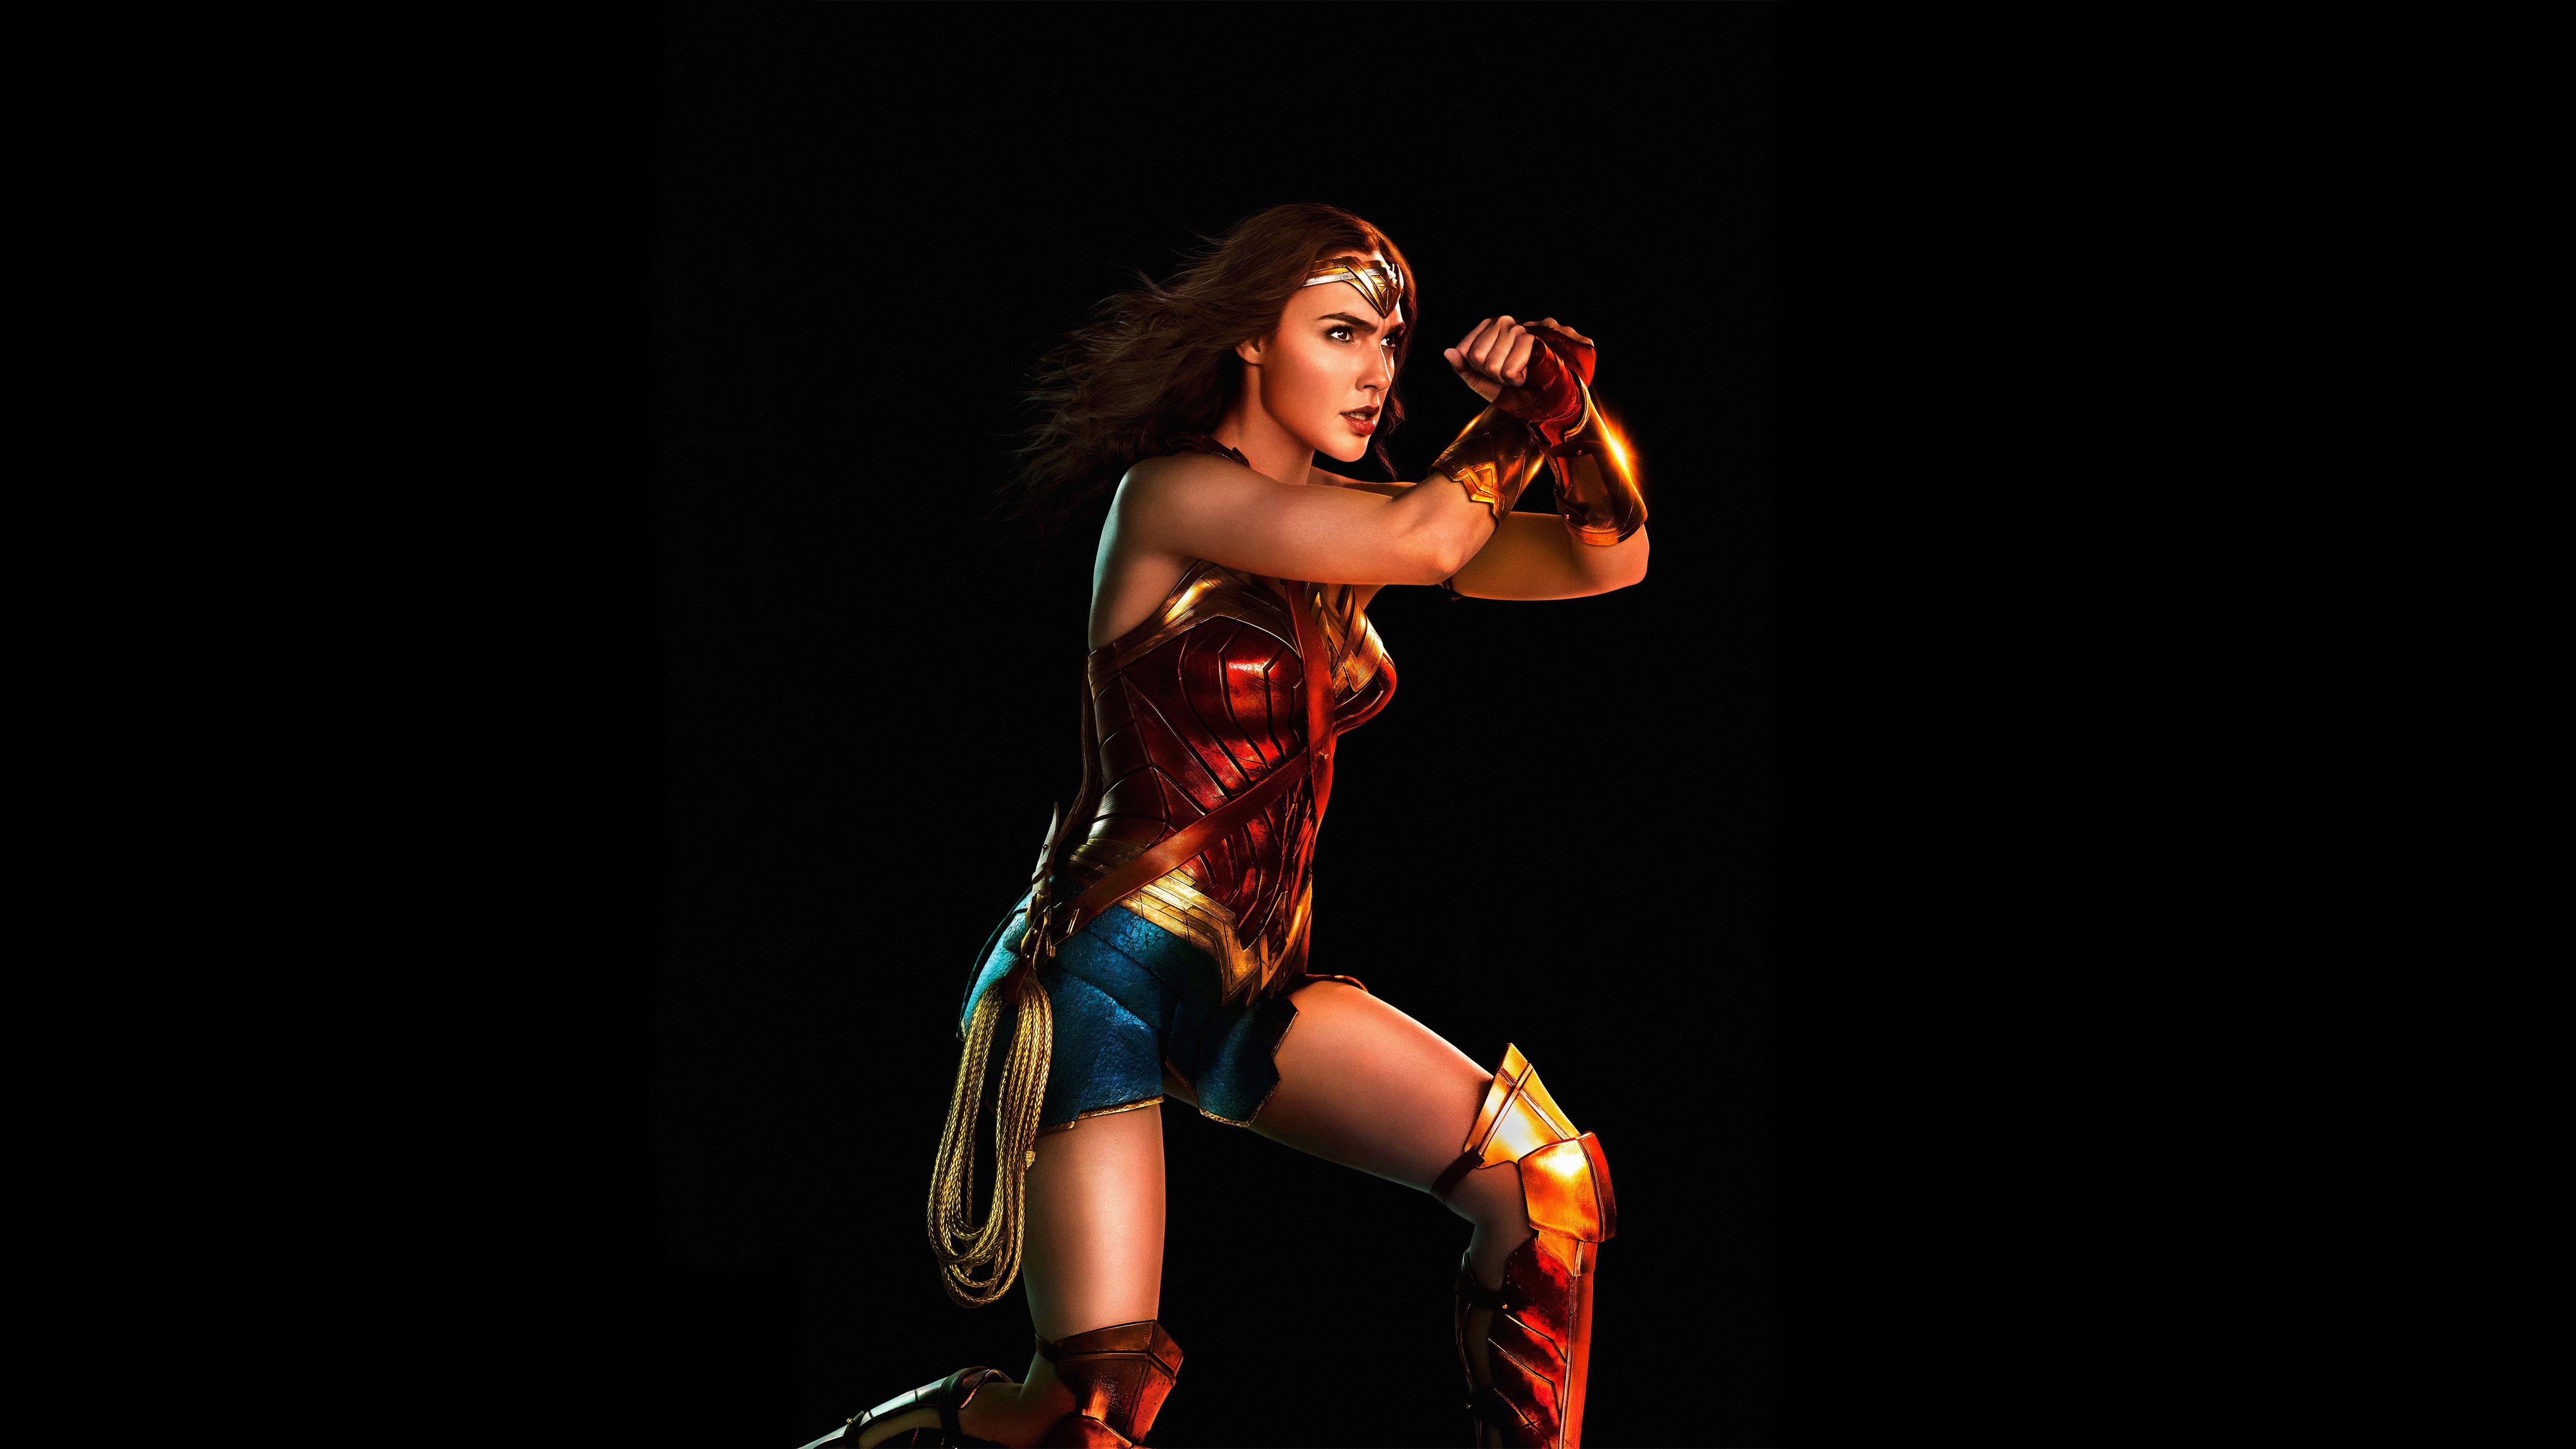 2017 Wonder Woman Wallpapers: 3840x2400 Wonder Woman Justice League 5k 4k HD 4k